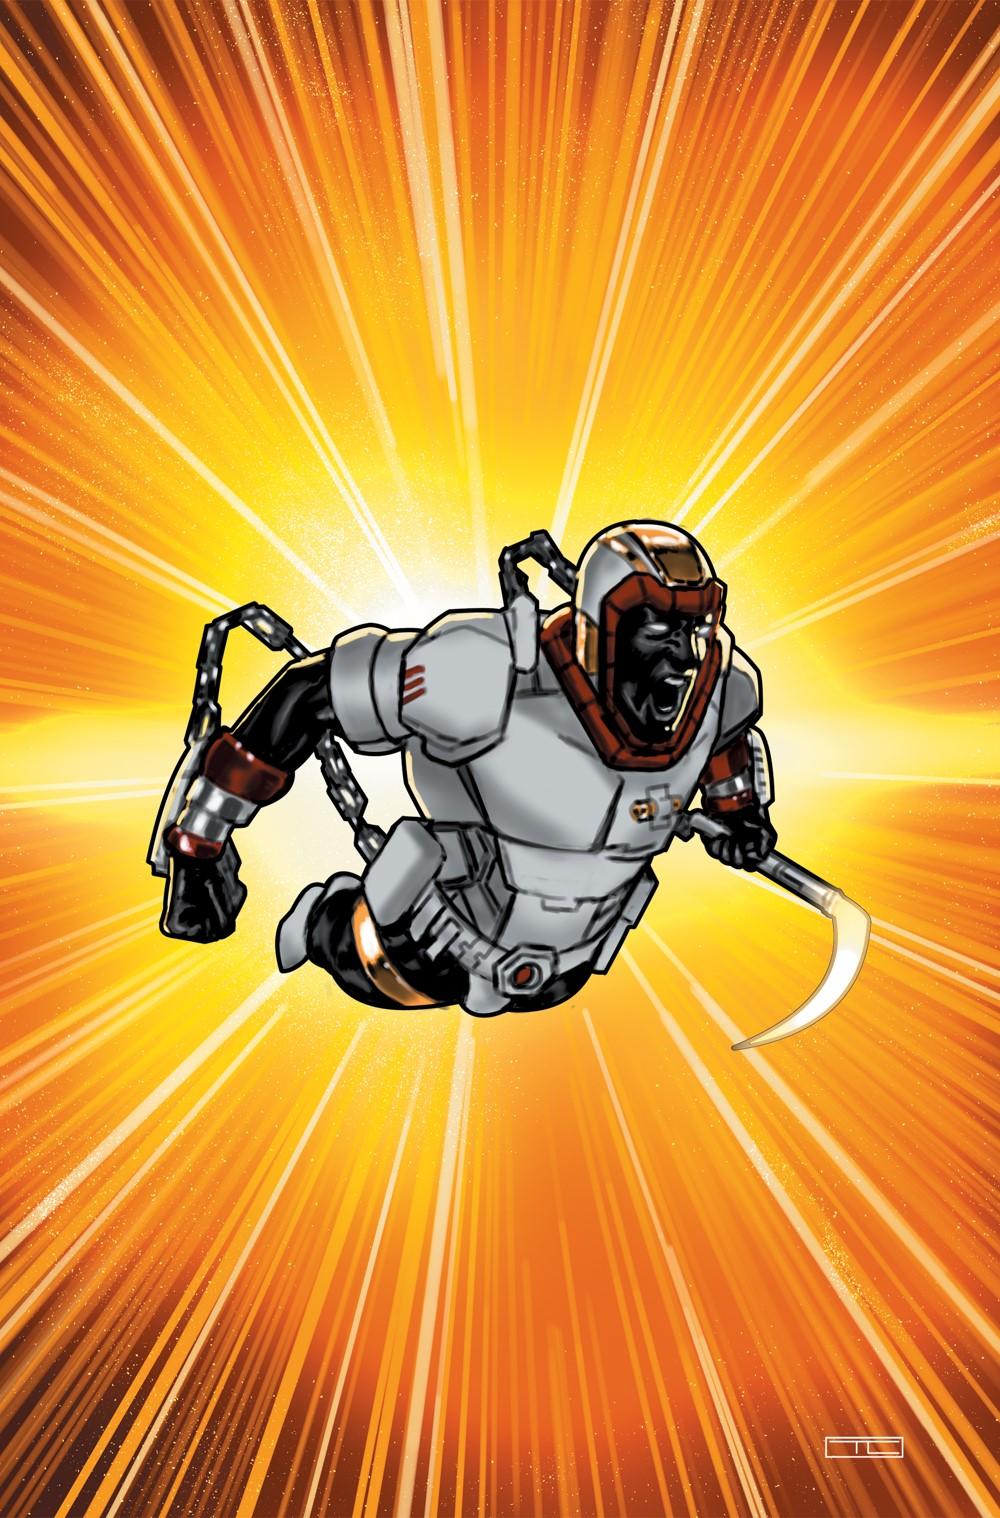 HARDWARE_S1_Cv3_NOTFINALCVR DC Comics October 2021 Solicitations